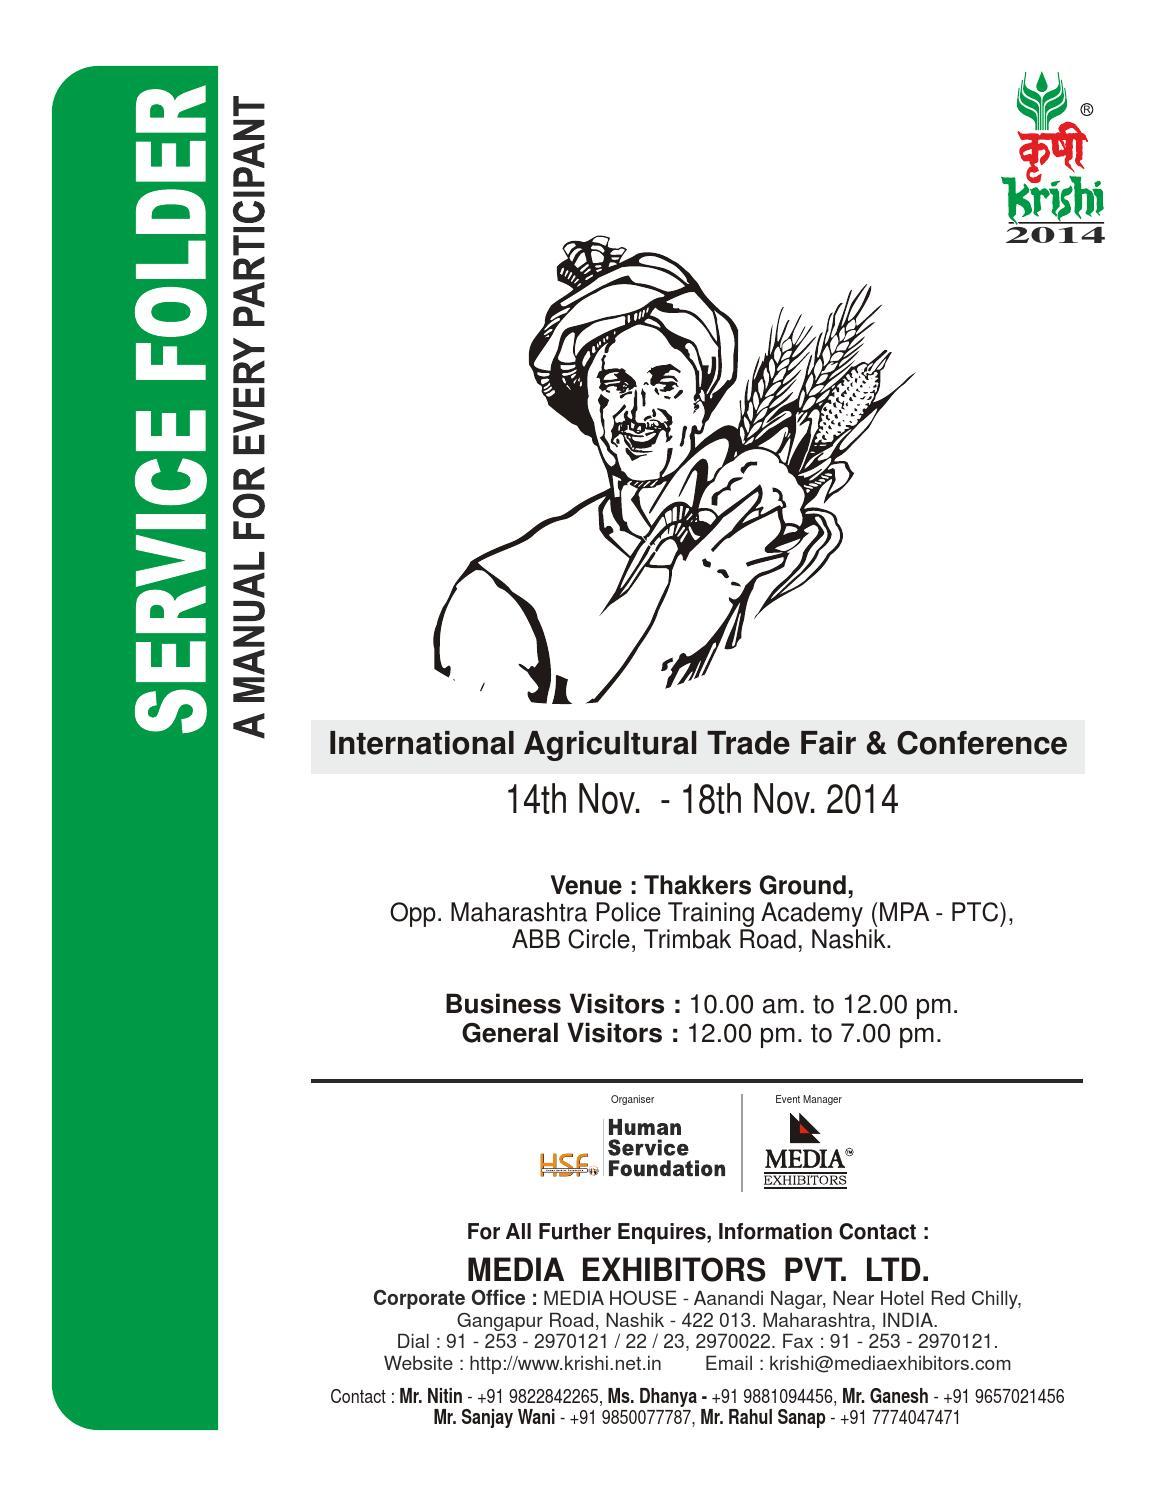 Exhibition Stall Checklist : Krishi exhibitors manual by krishithon issuu